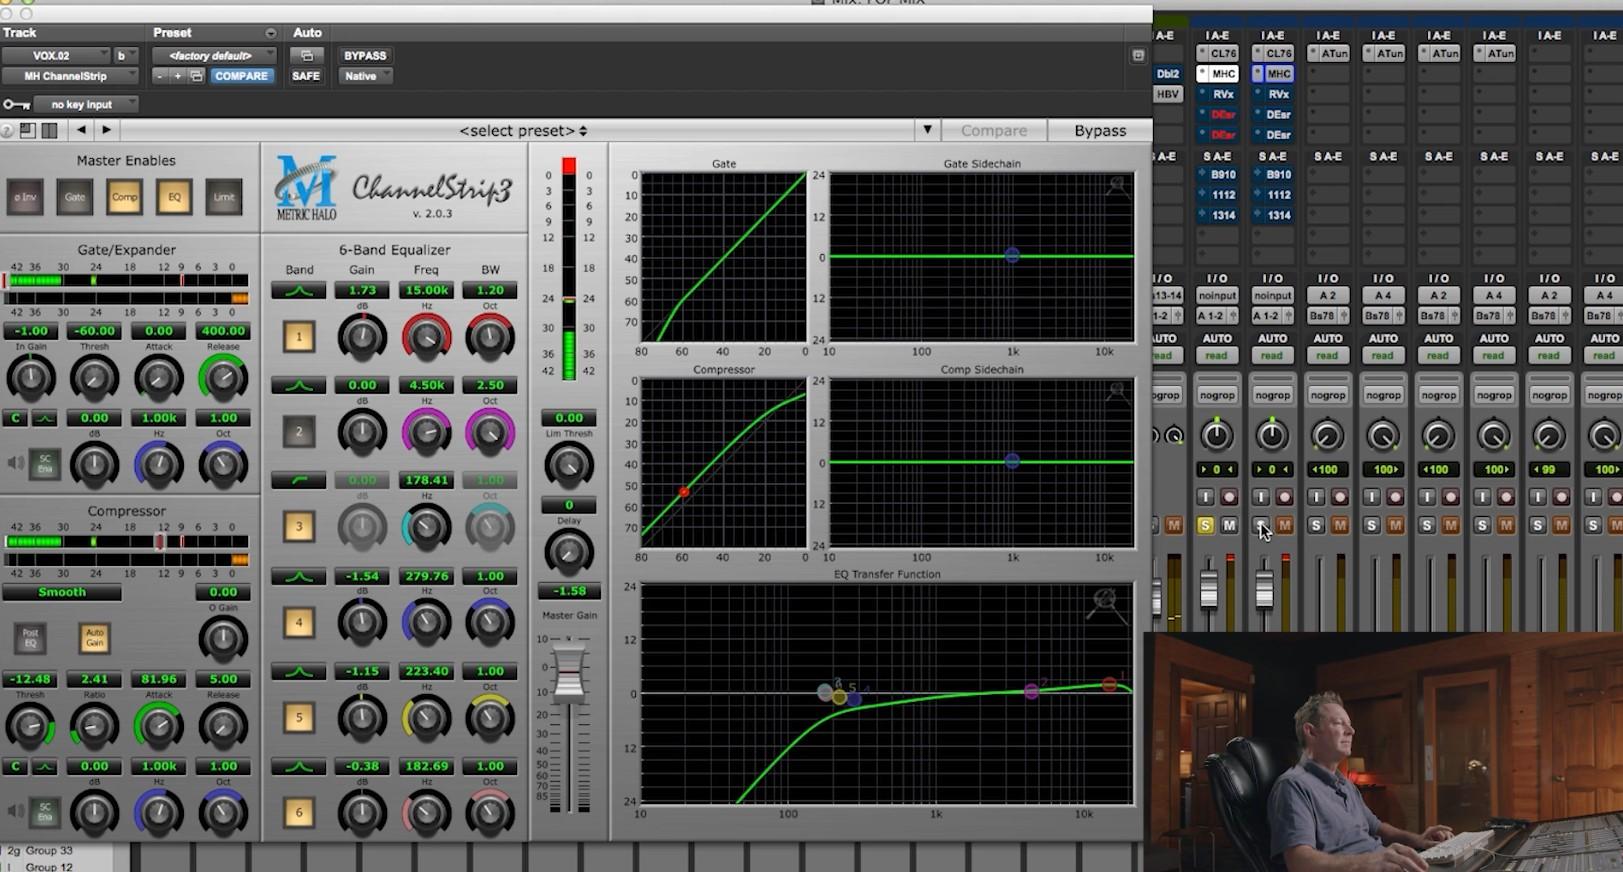 Temlate mixing music billy decker EQ